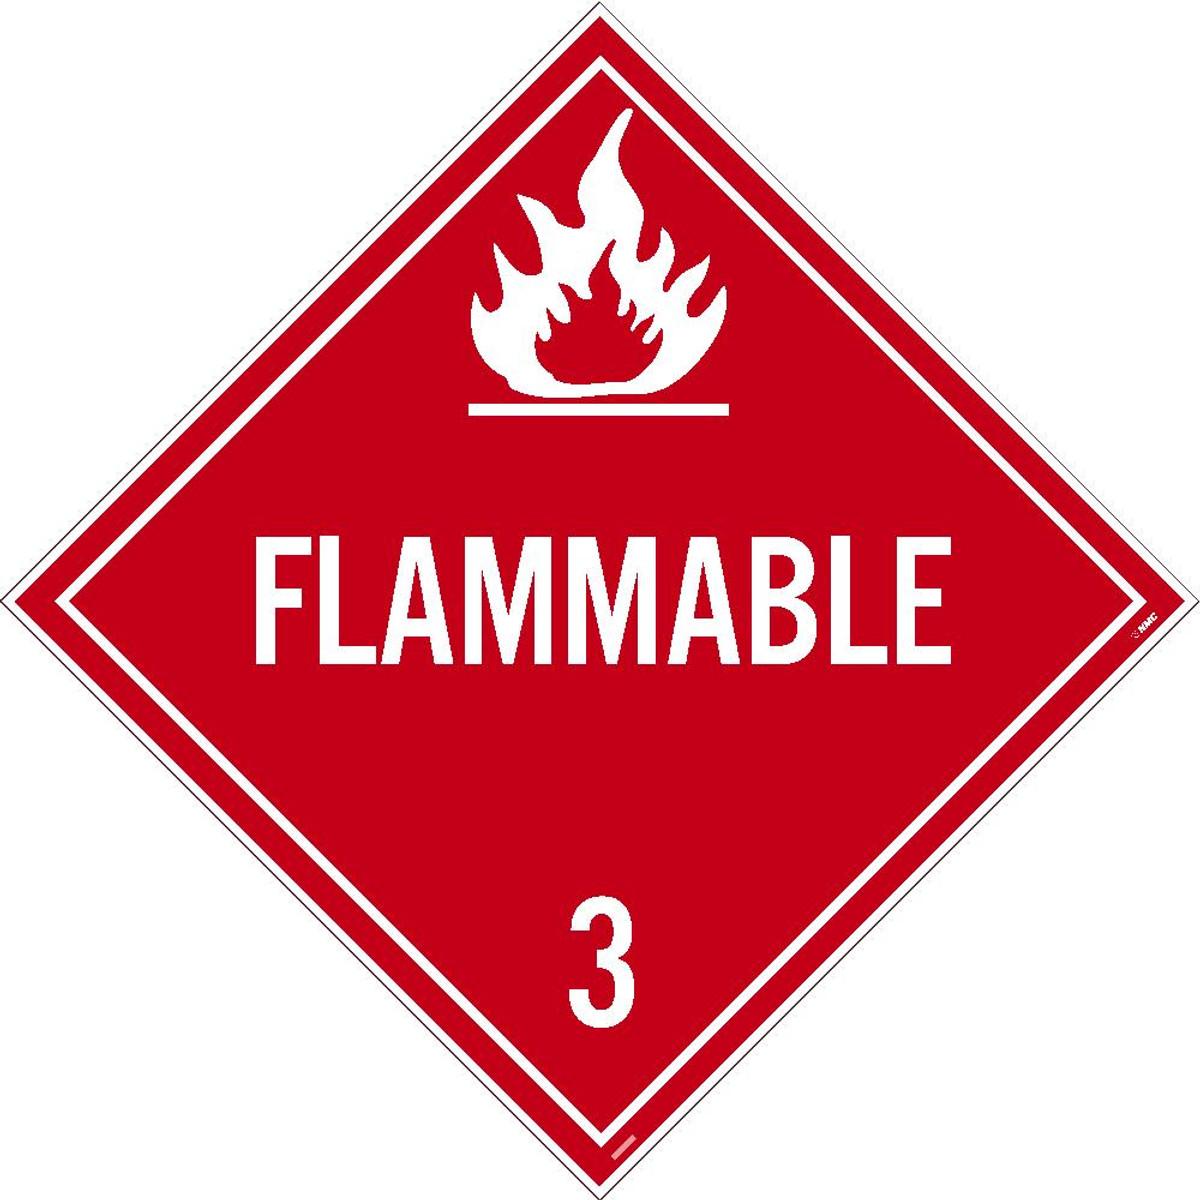 flammable 3 dot placard